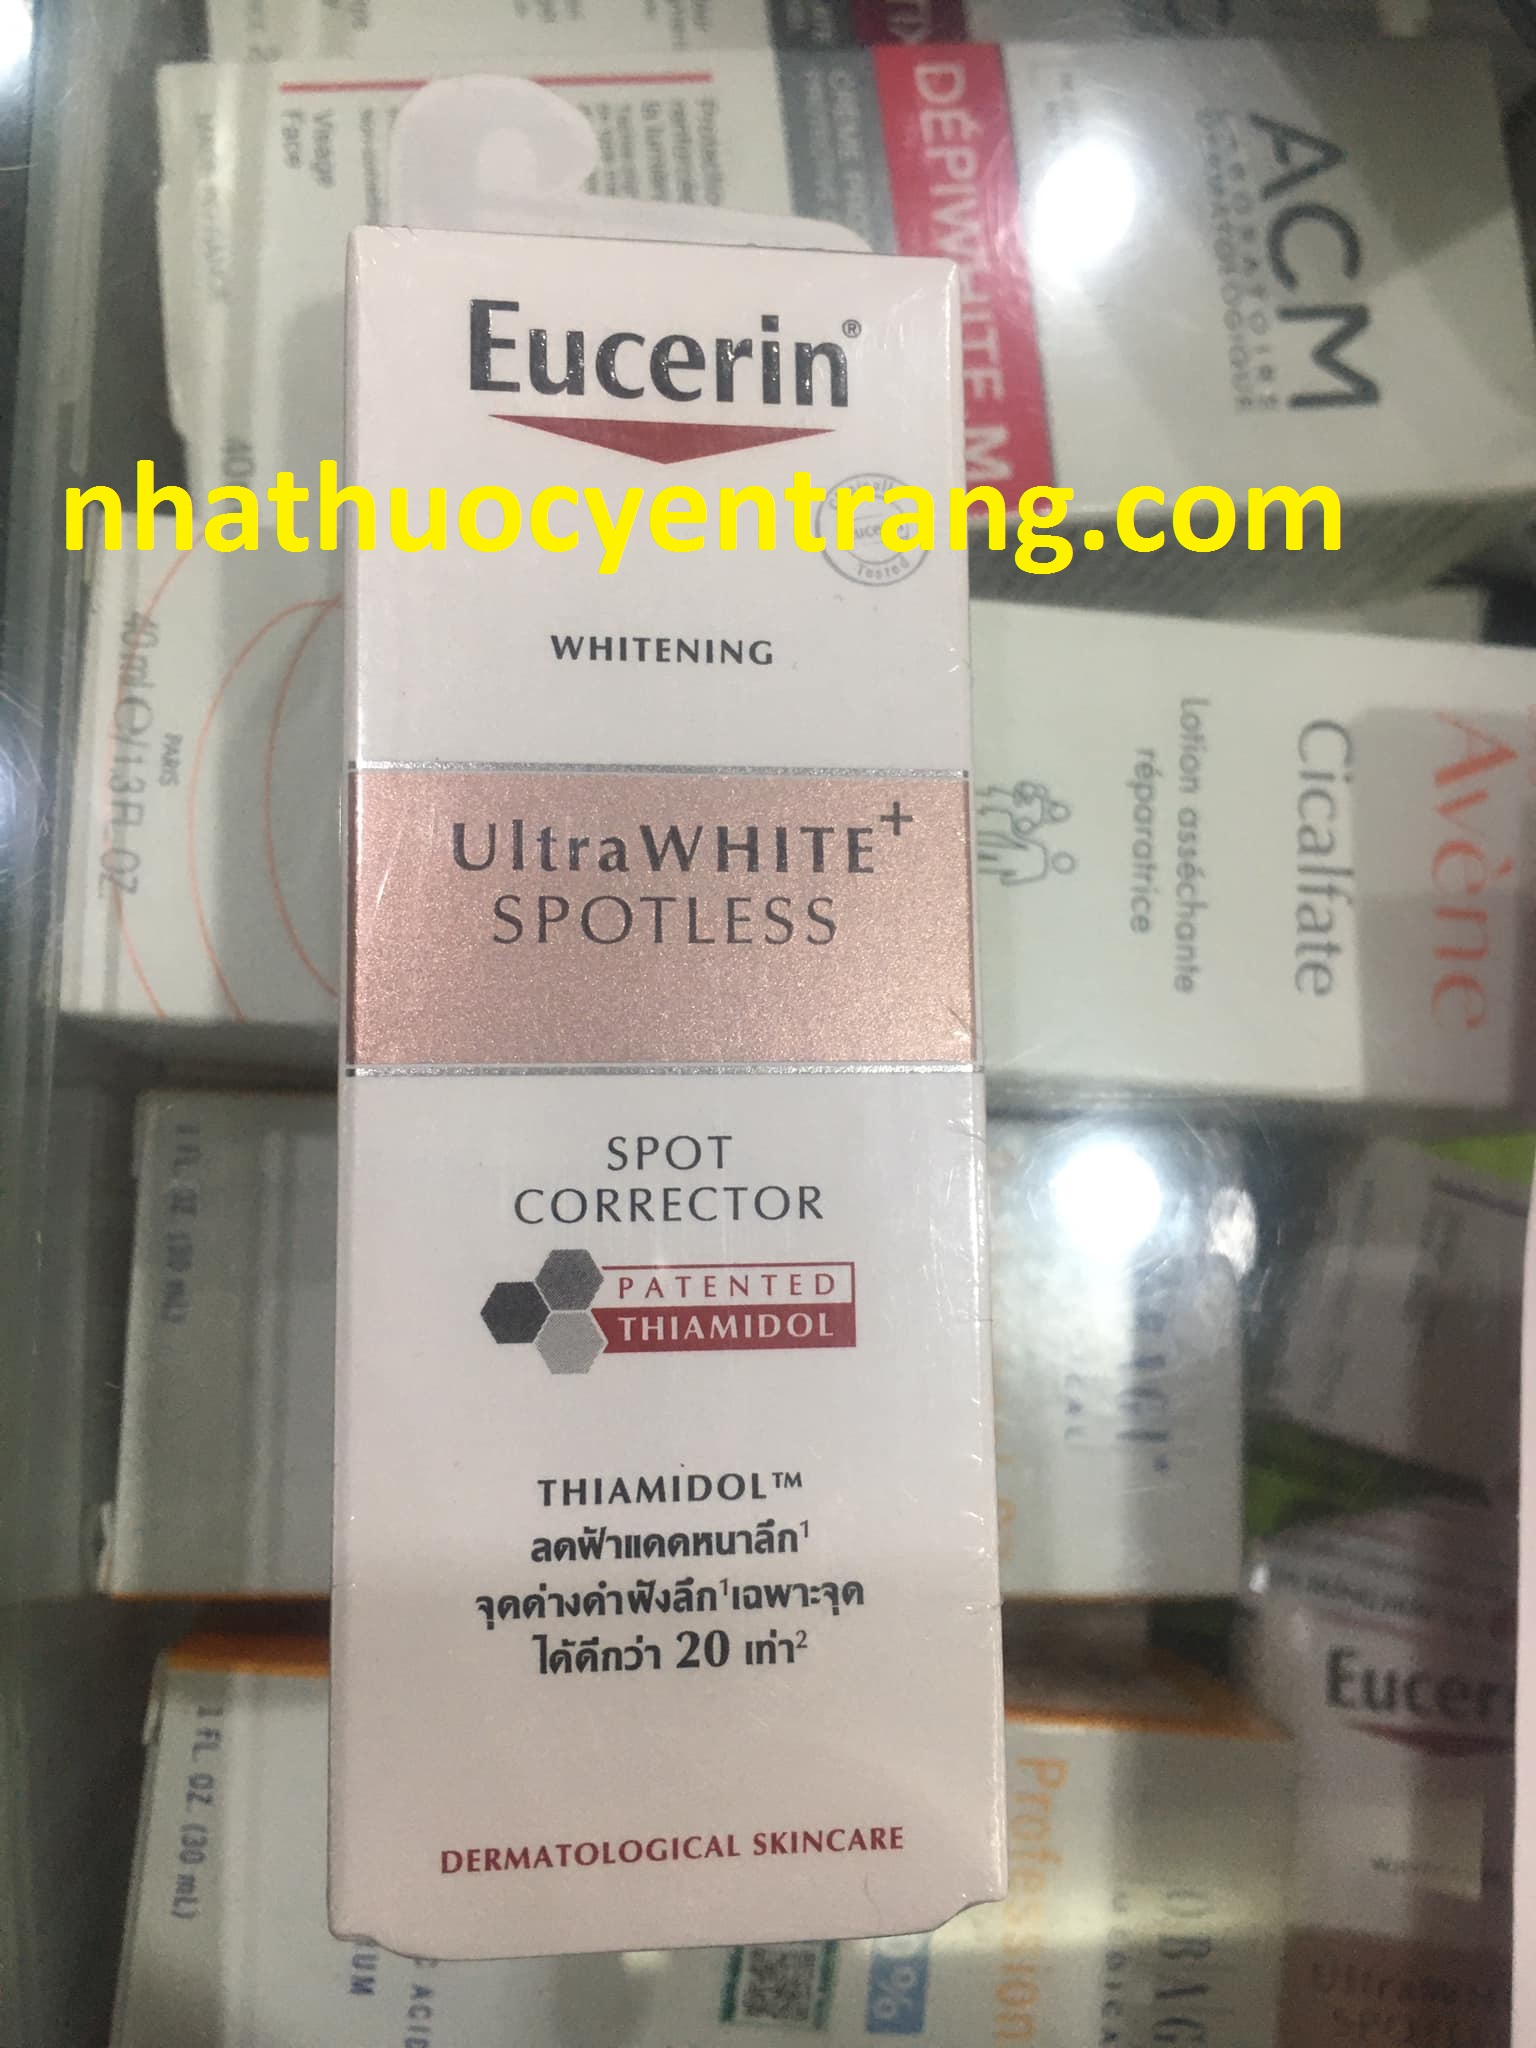 Eucerin UltraWhite Spotless 5ml